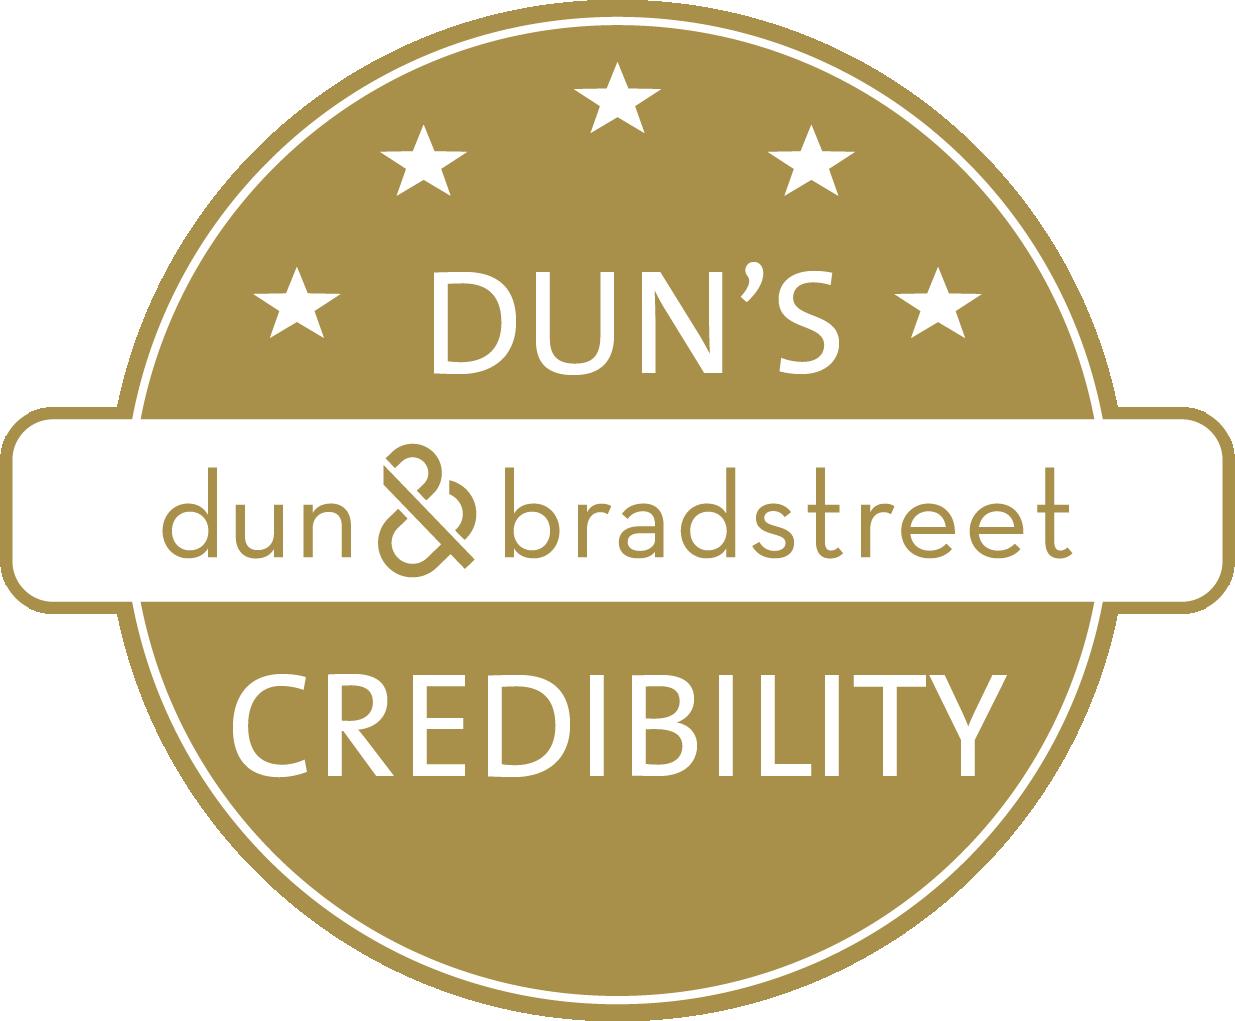 Dun & Bradstreet Credibility badge